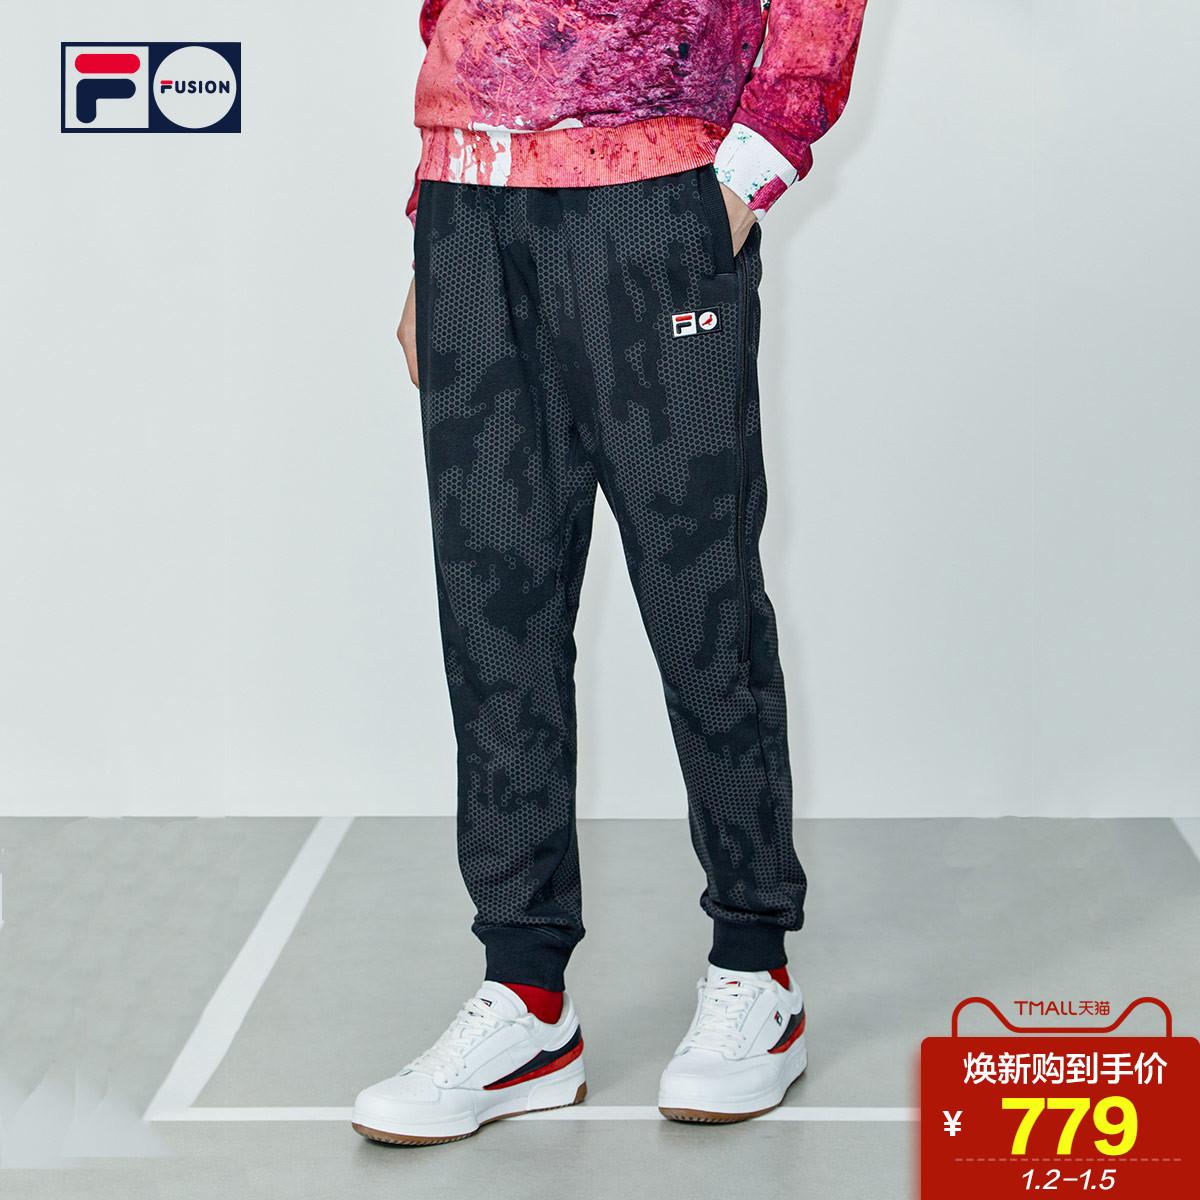 FILA FUSION X Staple斐乐长裤男2019春季新品休闲运动裤针织长裤